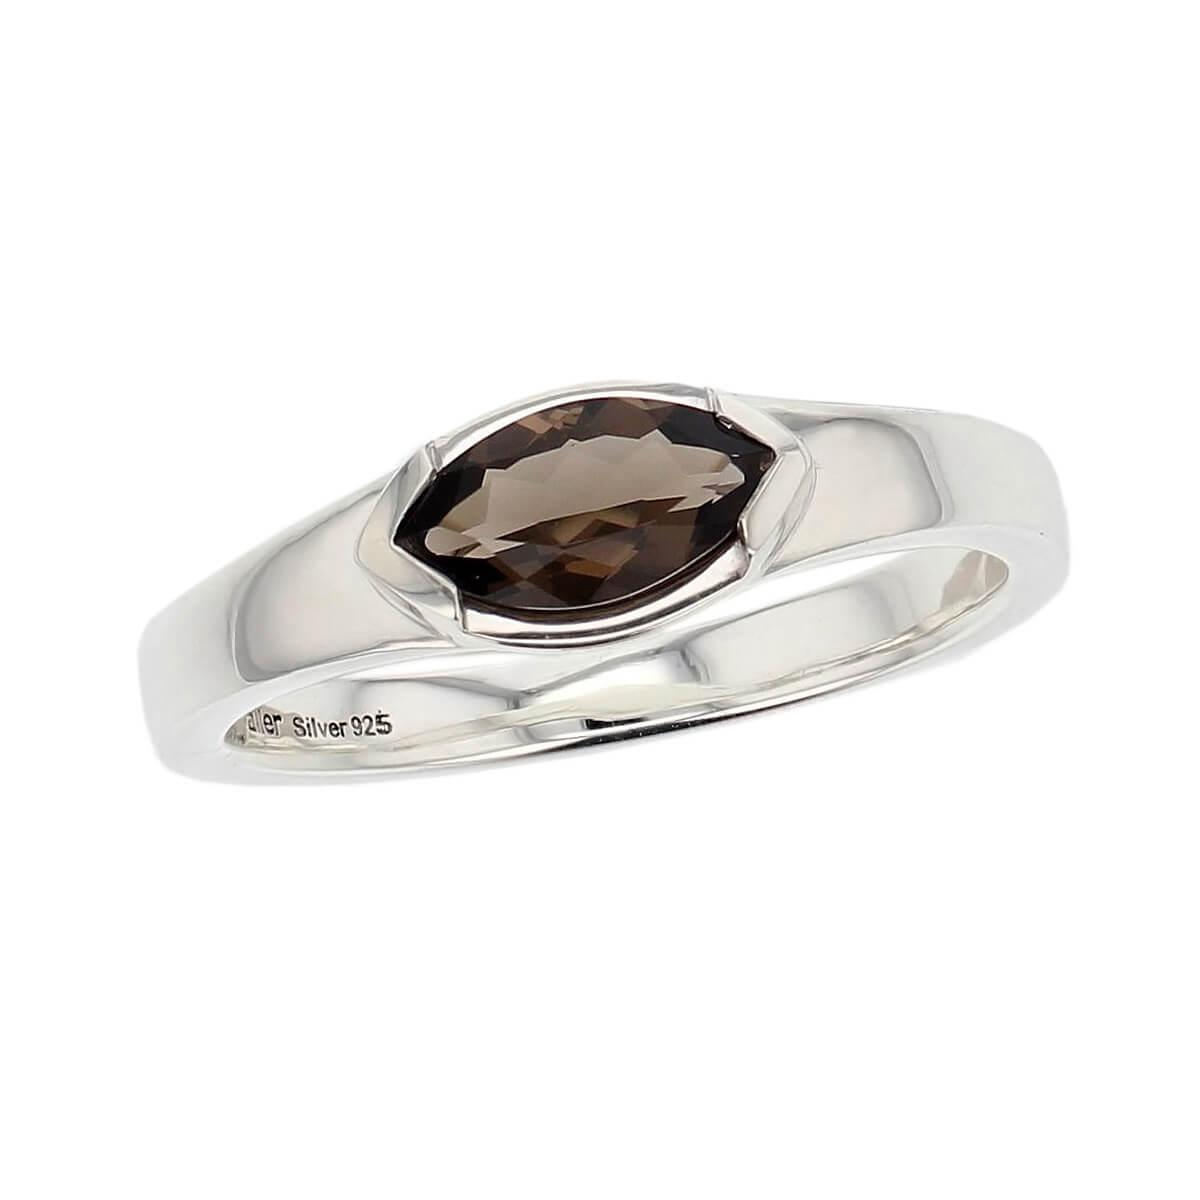 sterling silver marquise cut smoky quartz gemstone dress ring, designer jewellery, smokey quartz gem, jewelry, handmade by Faller, Londonderry, Northern Ireland, Irish hand crafted, darcy, D'arcy, navette